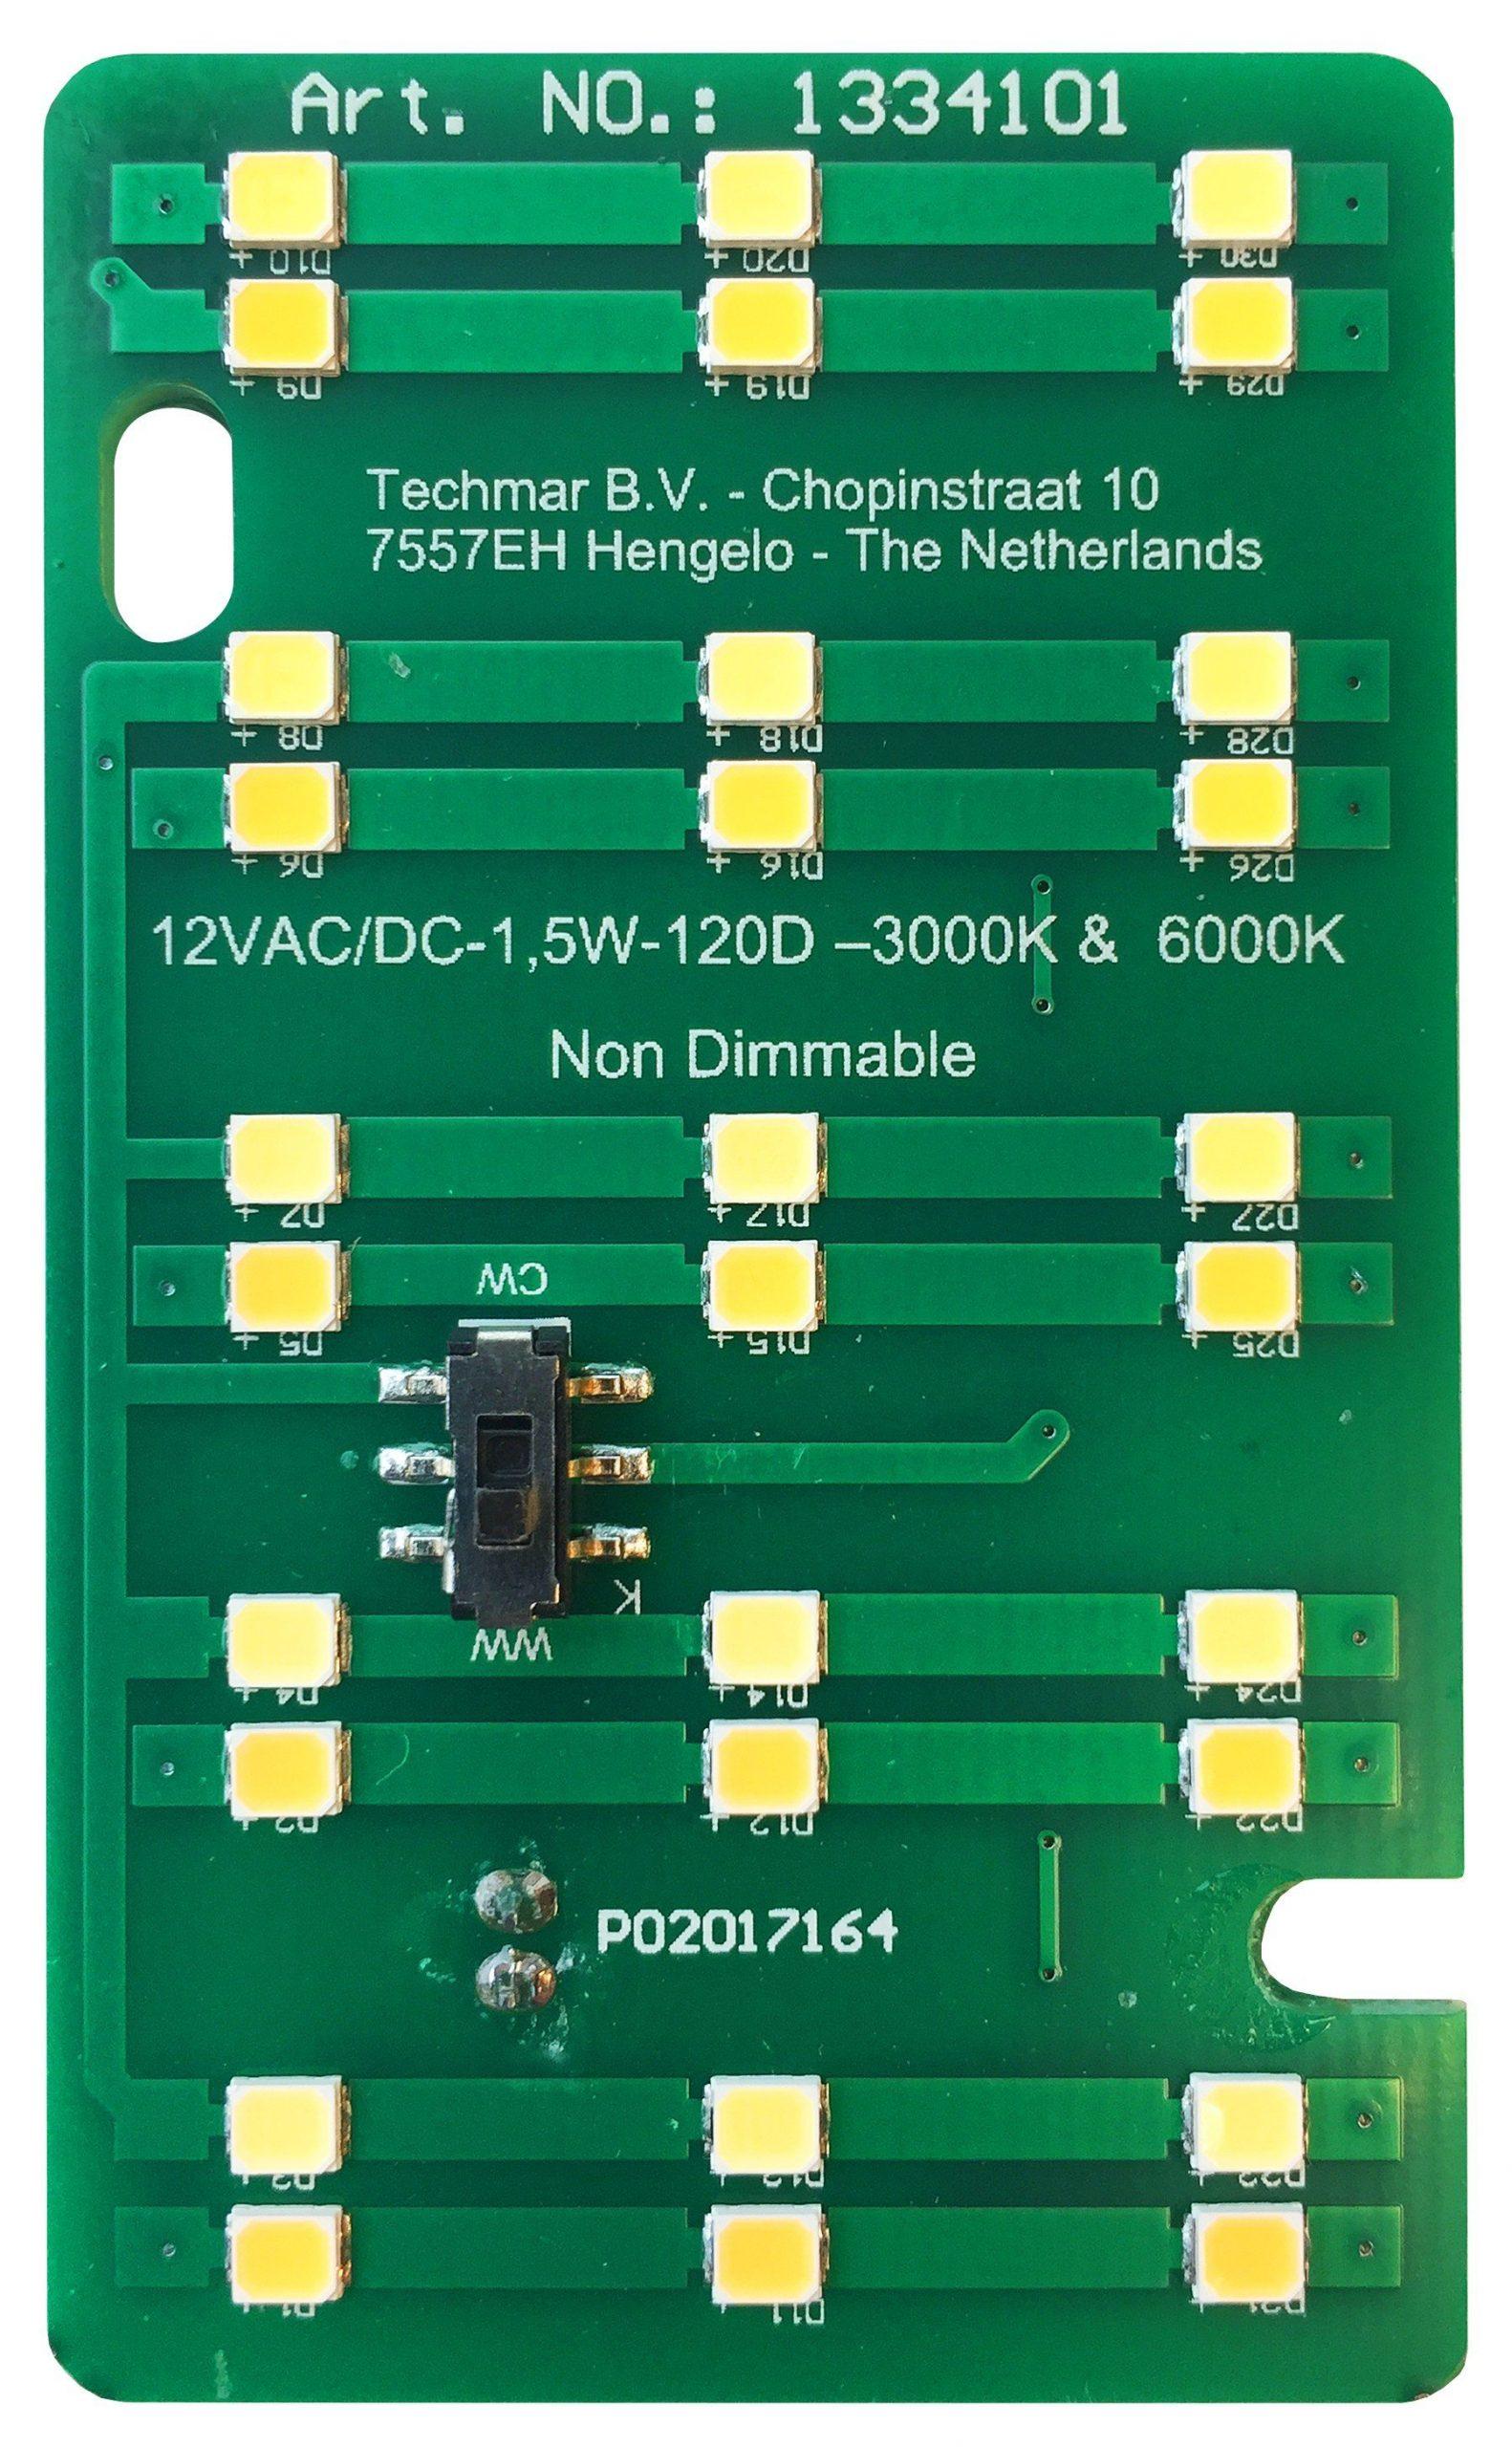 GardenLights 12V – 15 x SMD LED unit – 2W – 3000K-6000K 1334101 | 5907800858075